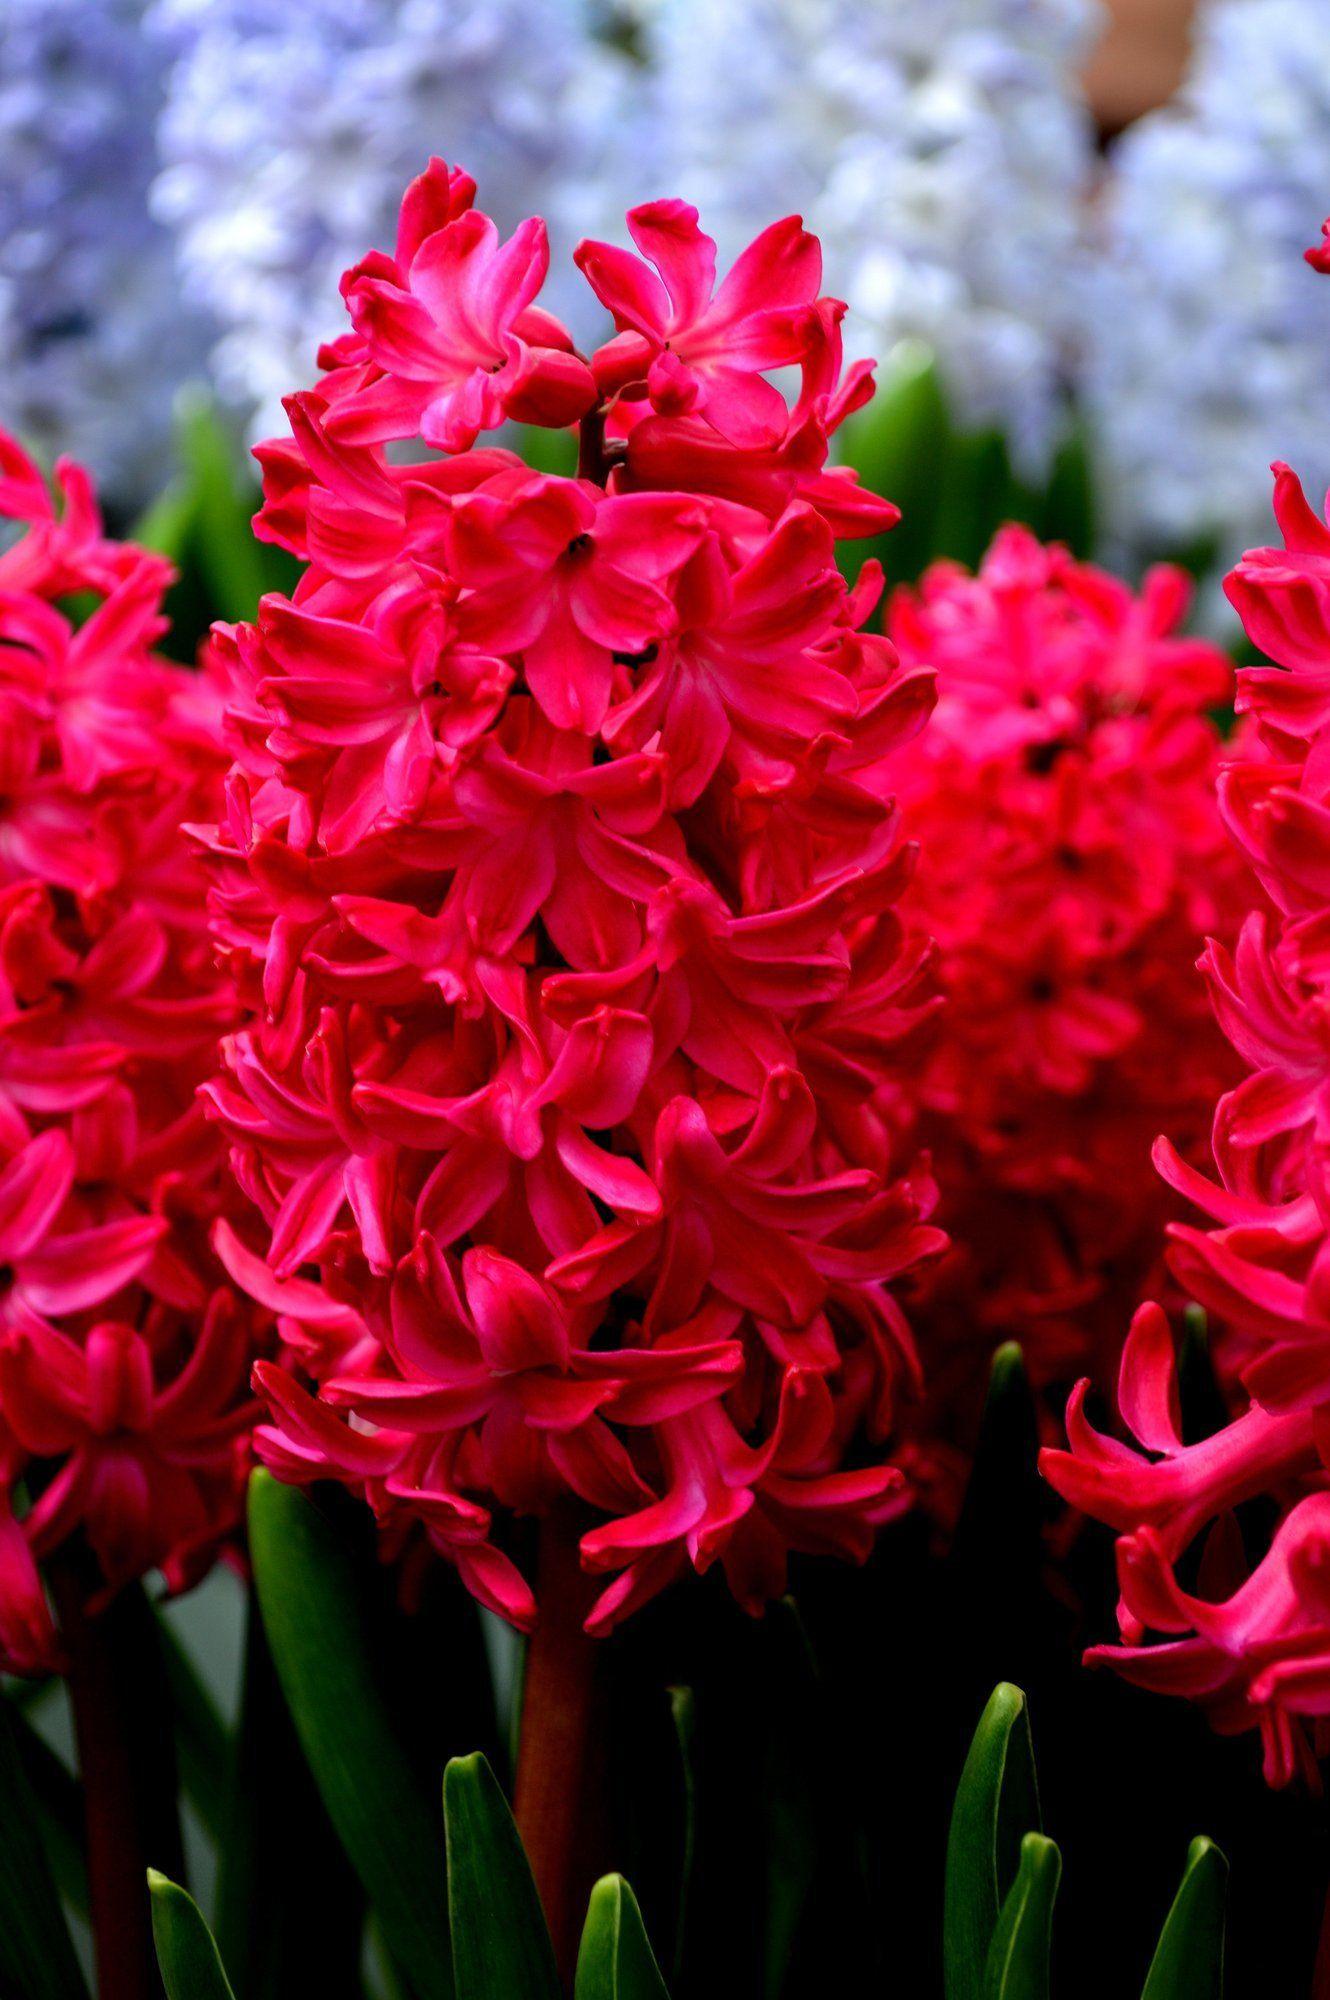 5 Bright Red Hyacinthus Bulbs Garden Hardy Perennial Flower Fragrant Container Bulb Spring Bulb Fall Landsca Red Perennials Flowers Perennials Hardy Perennials